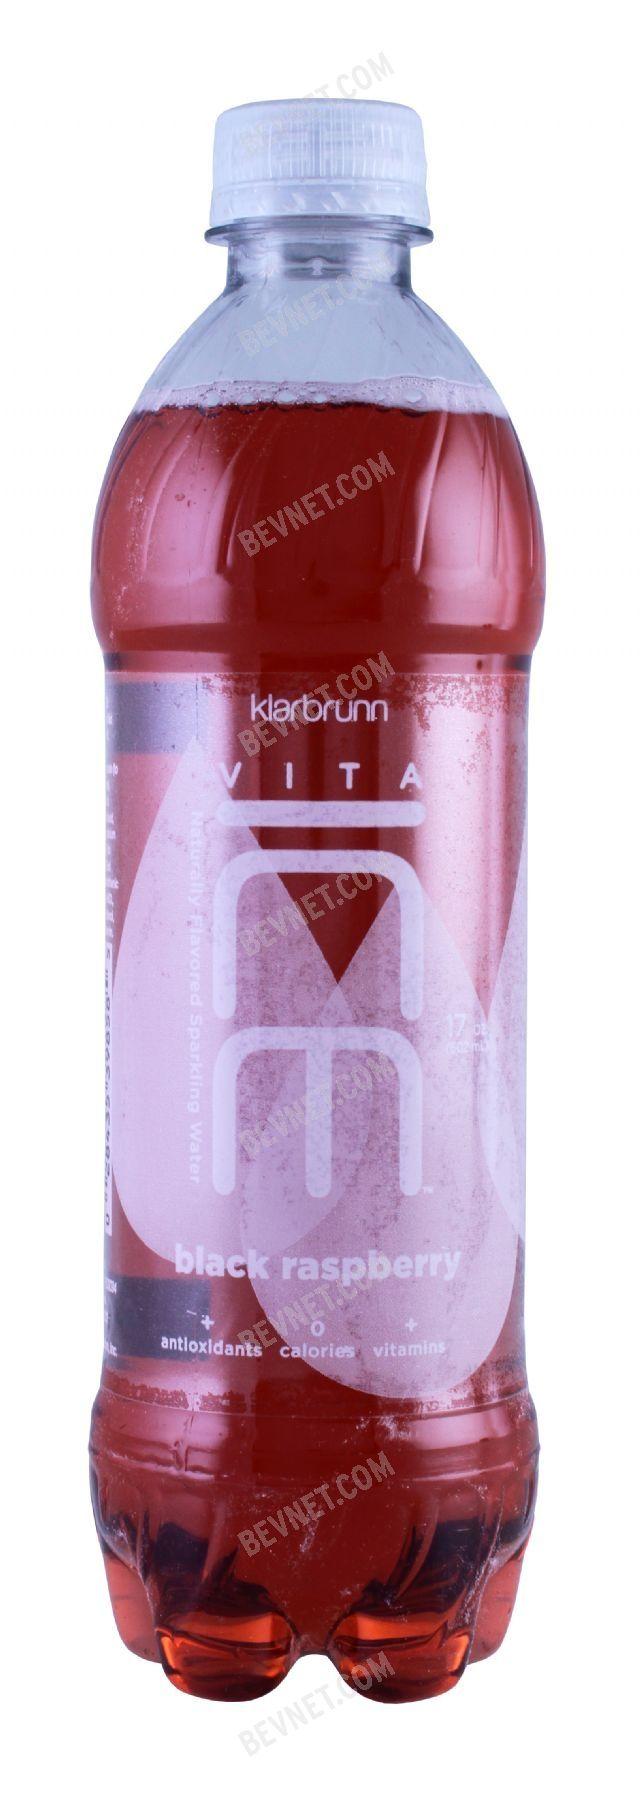 Klarbrunn Vita Ice: